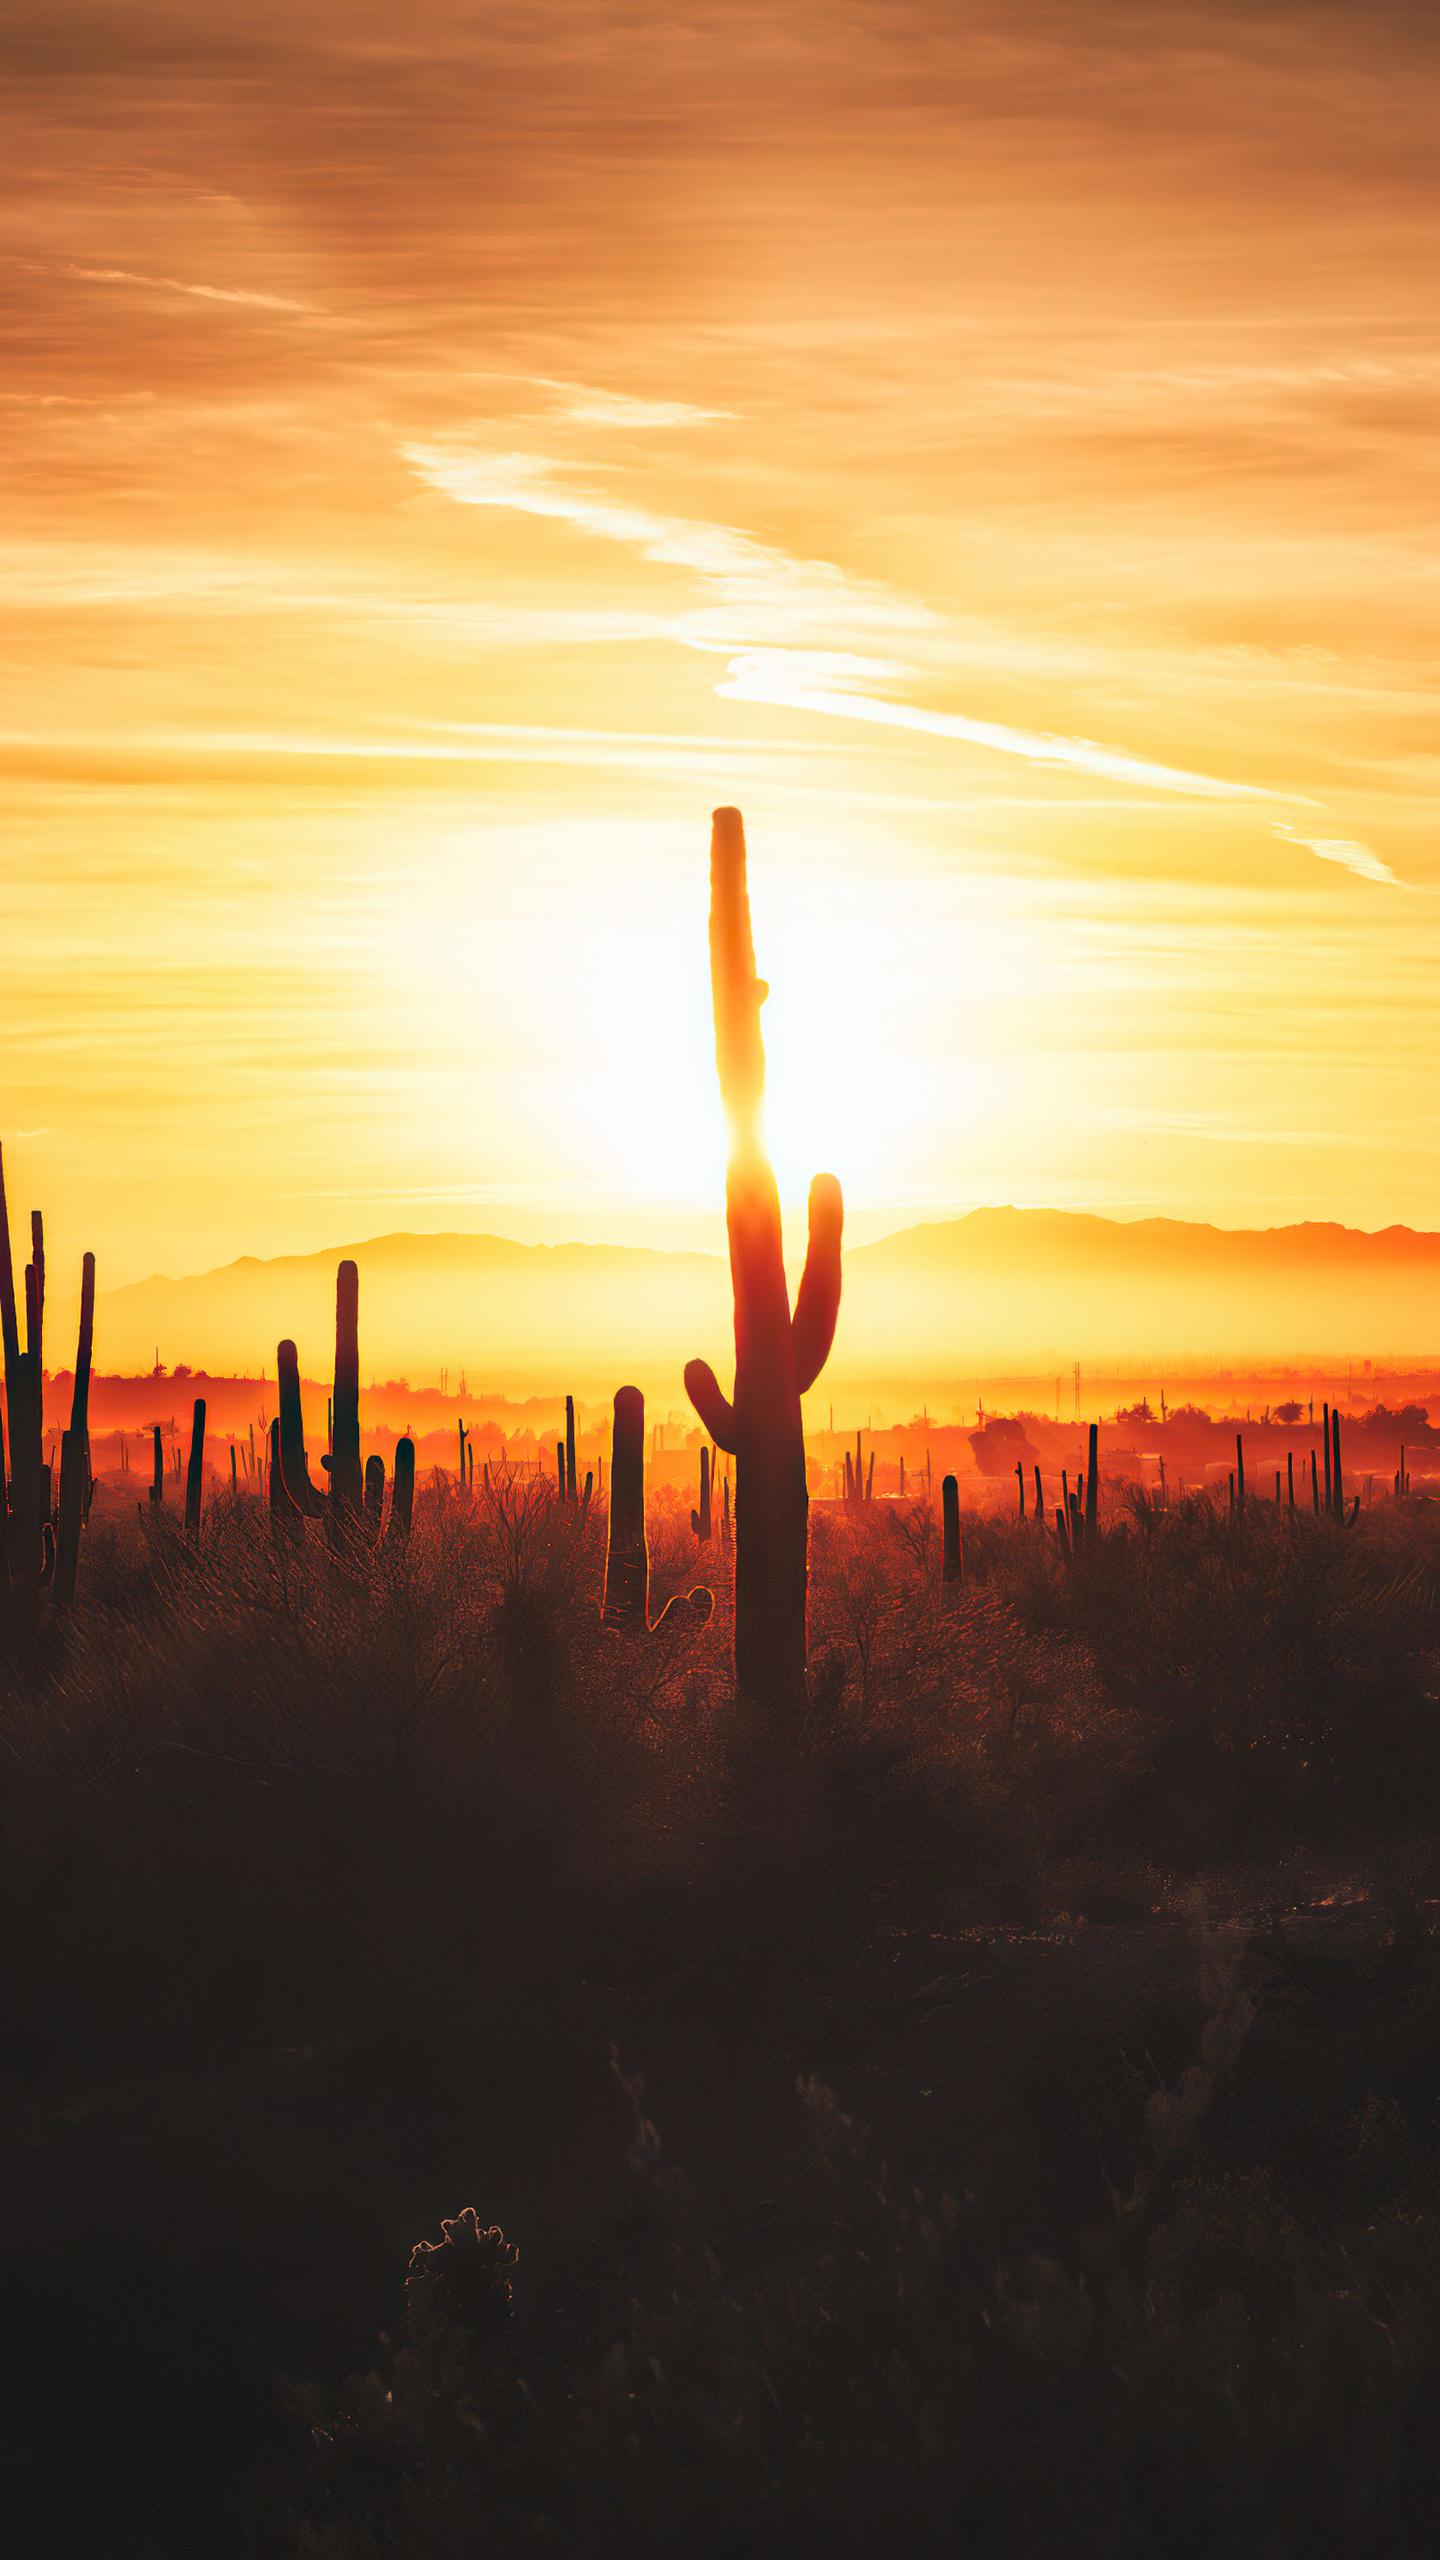 cactus-field-sunset-4k-kn.jpg